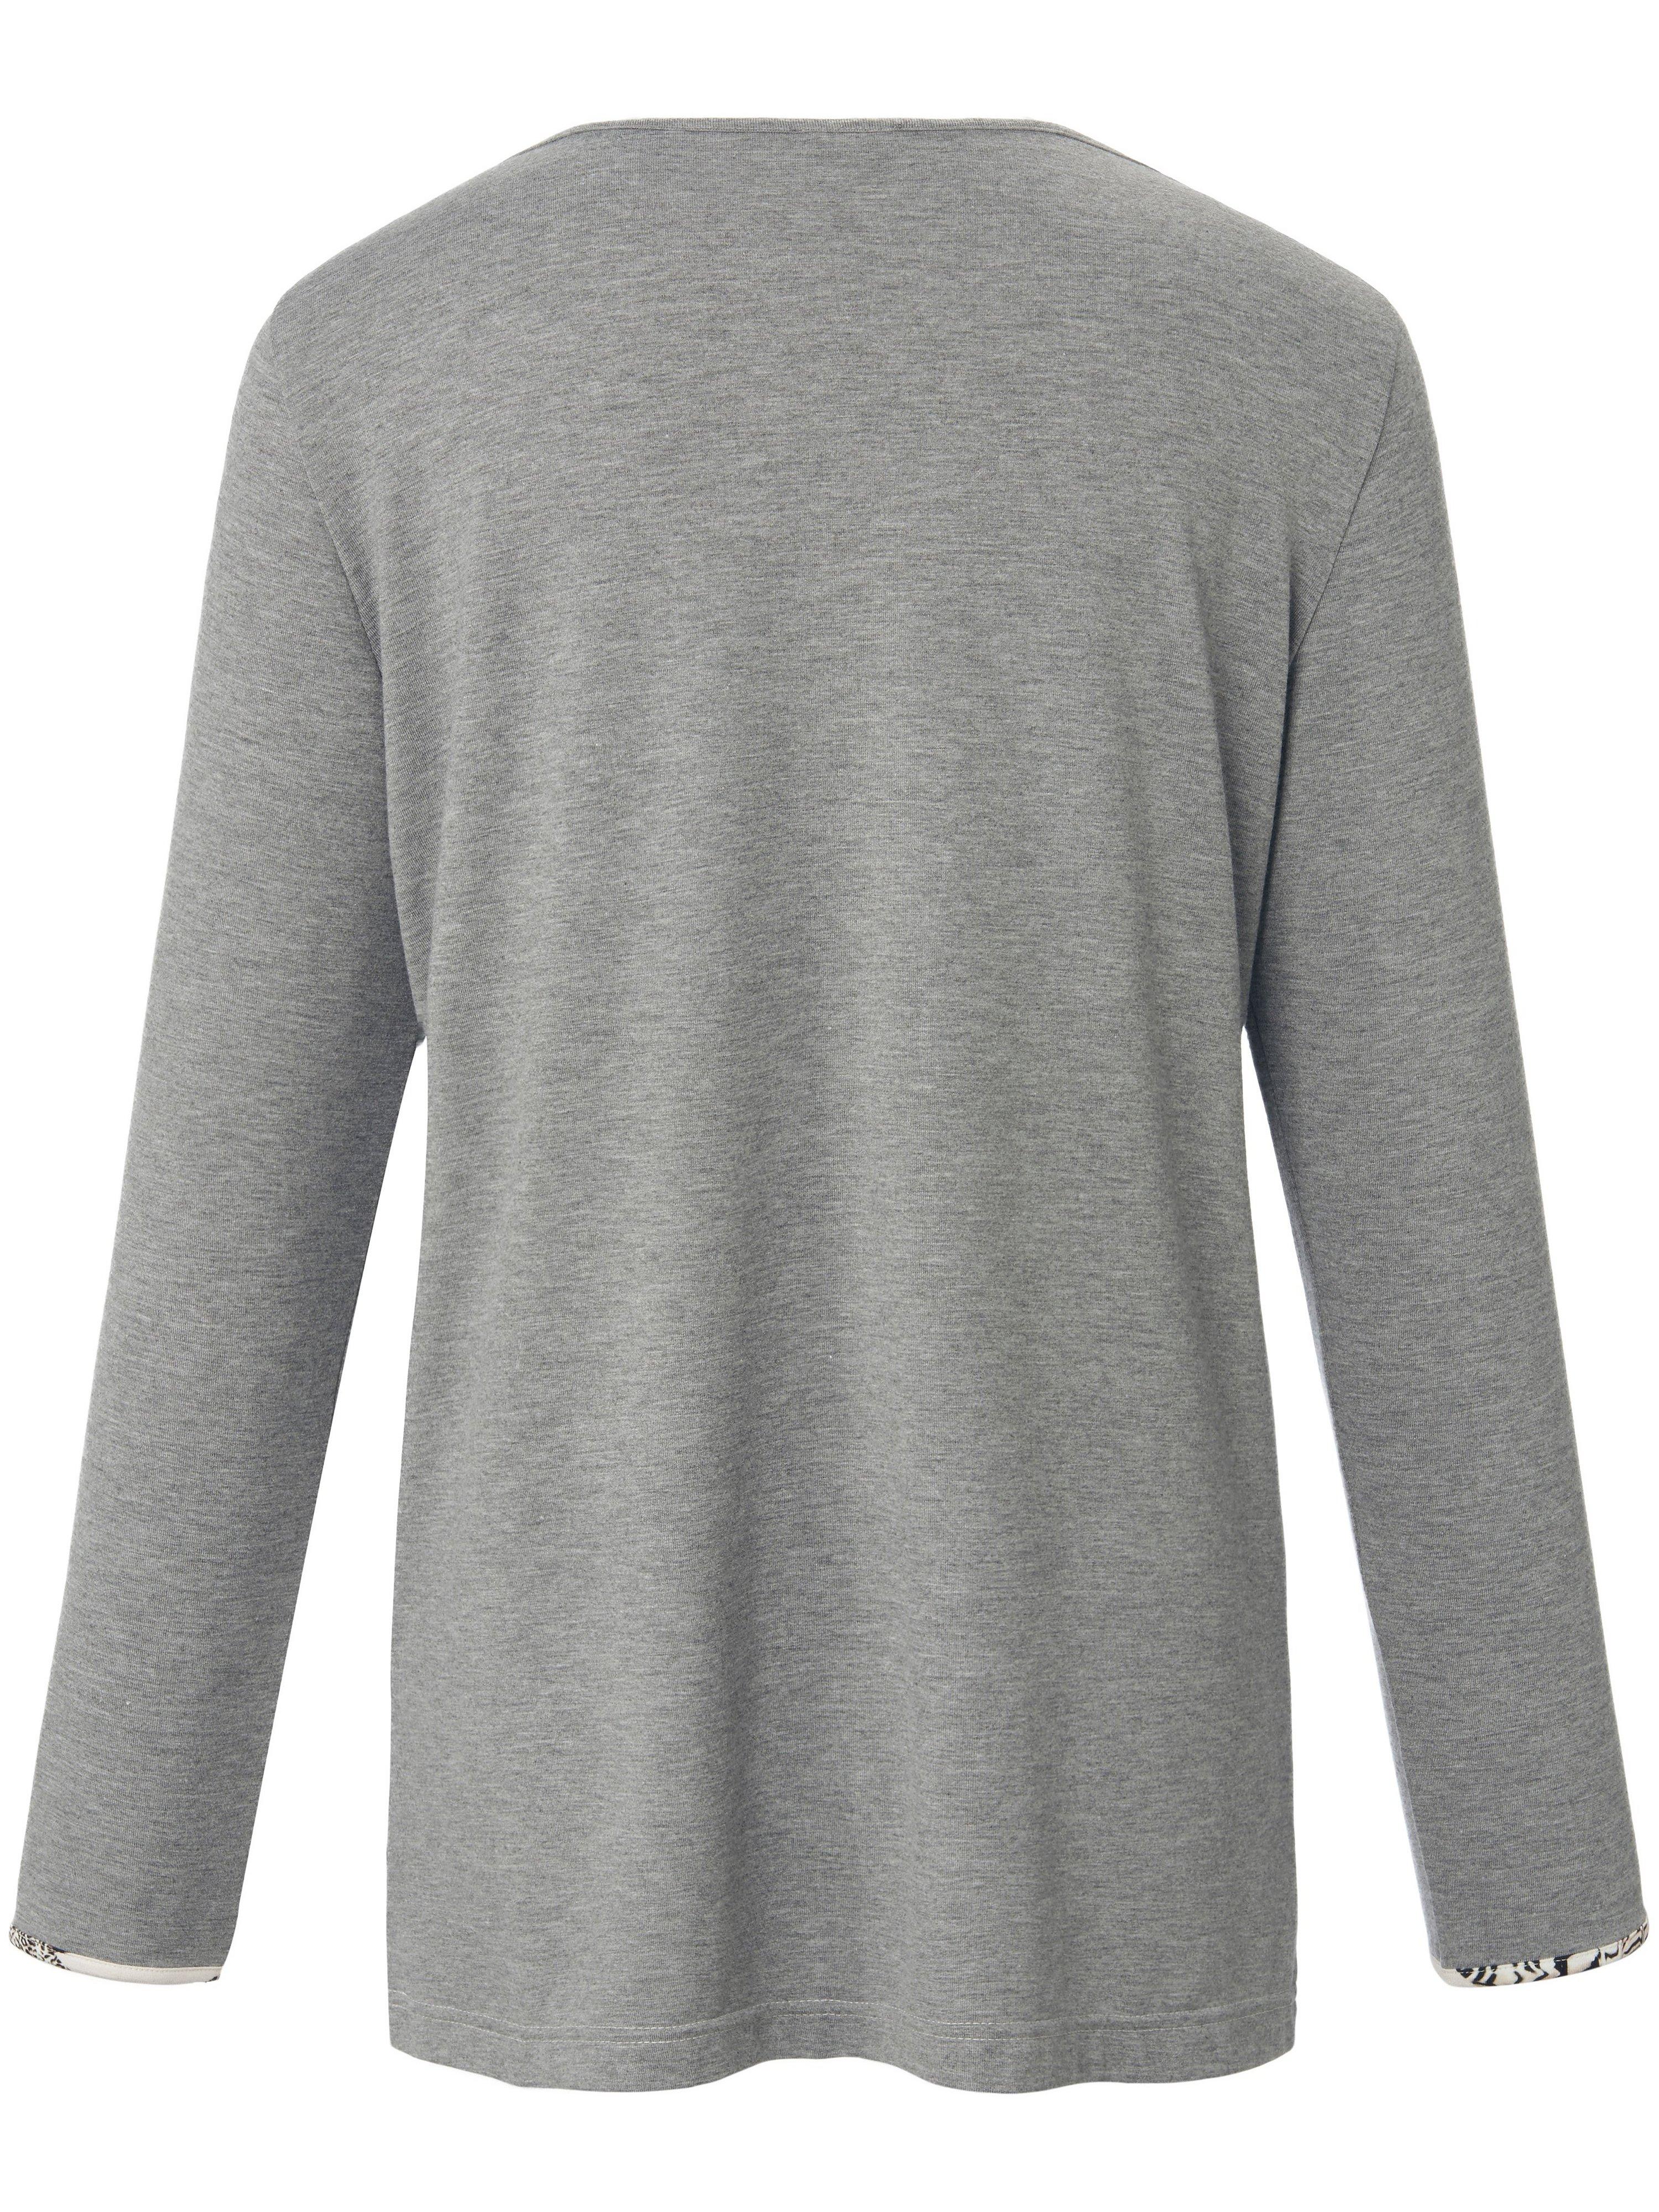 Pyjamas Fra Hutschreuther One grå